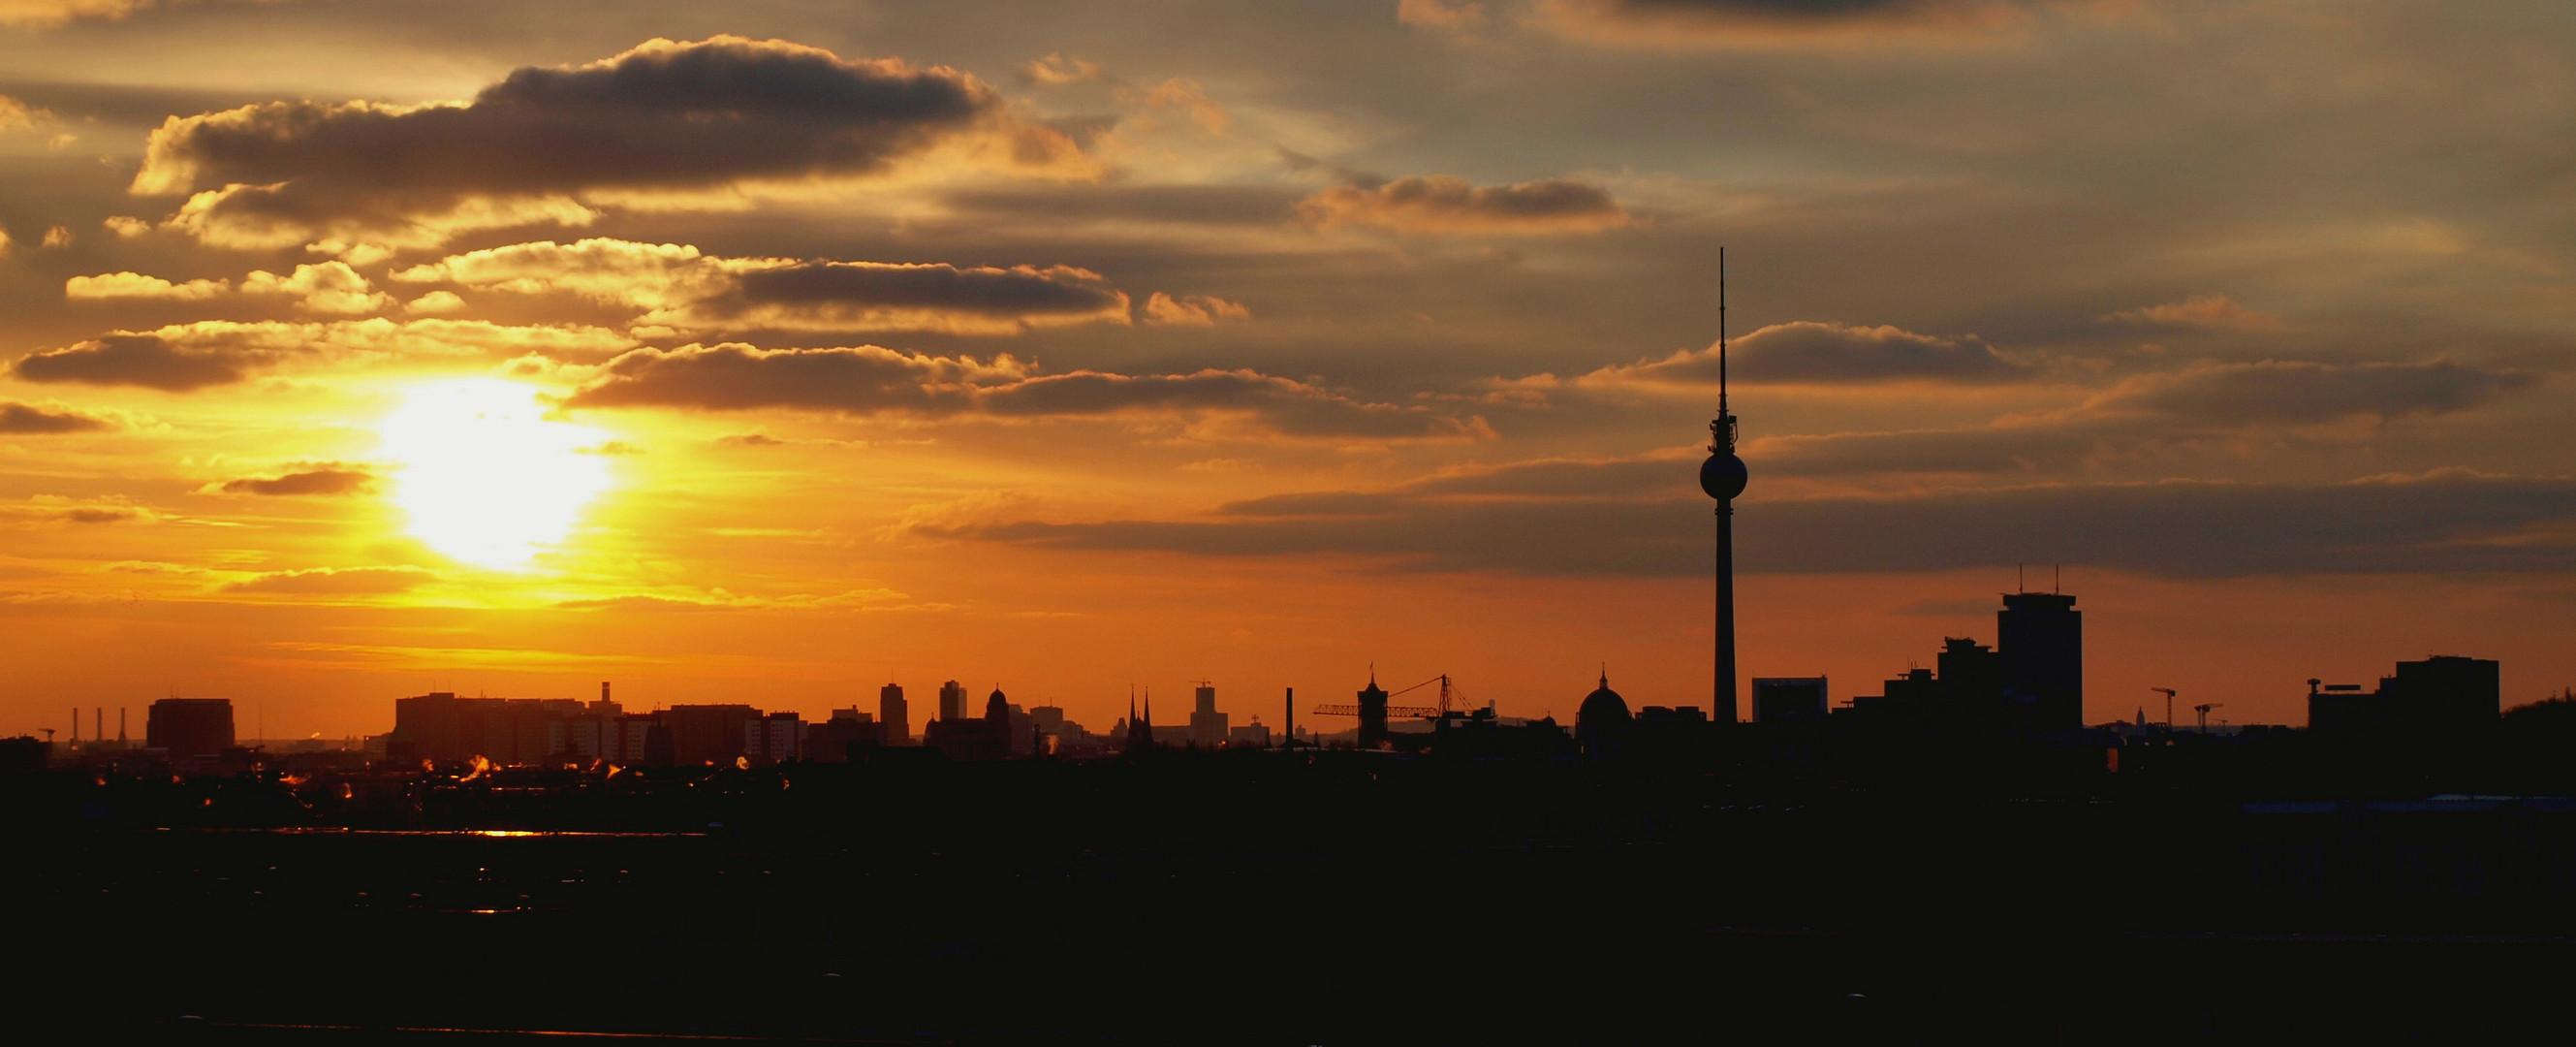 Sonnenuntergang in Berlin (Blick auf Fernsehturm)